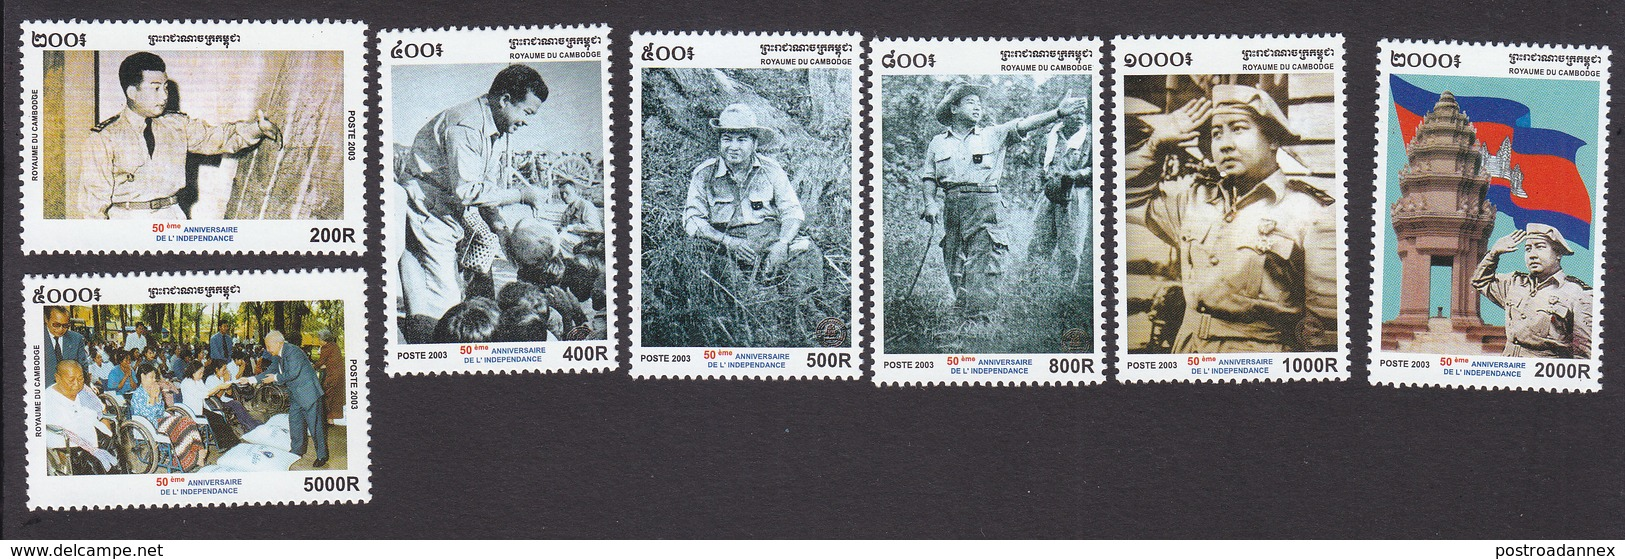 Cambodia, Scott #2203-2209, Mint Hinged, King Norodom Sihanouk, Issued 2003 - Cambodge